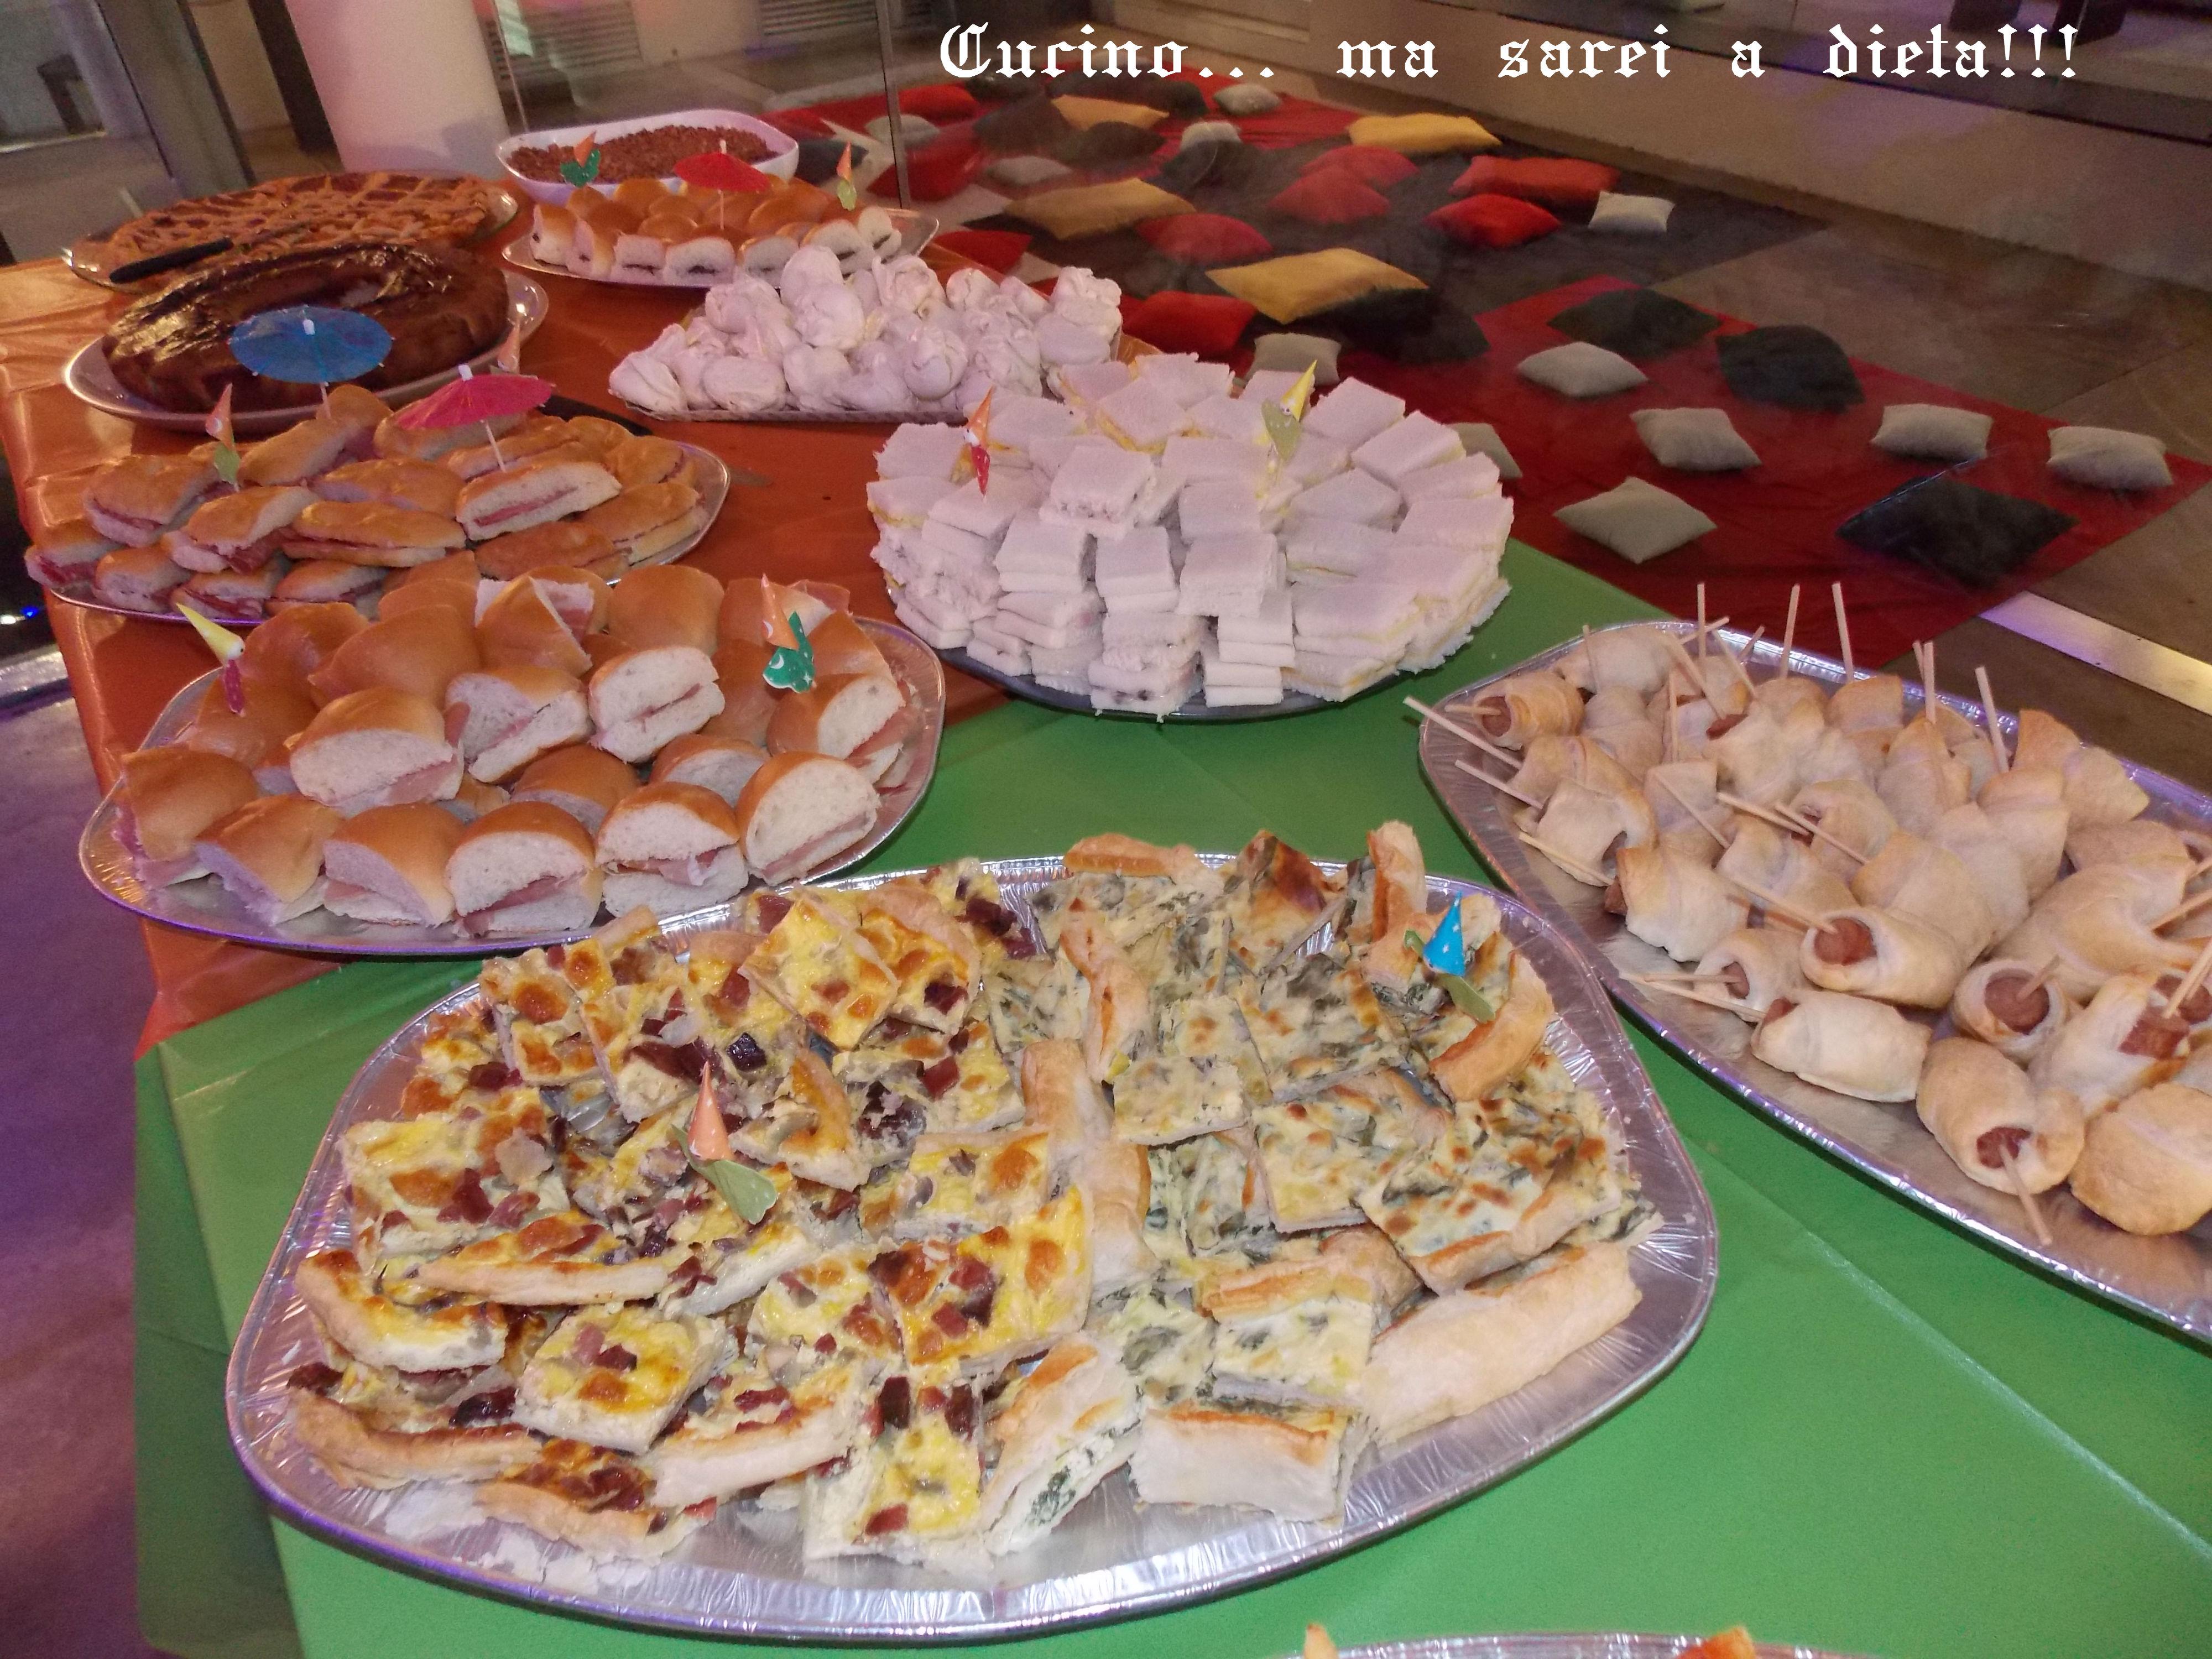 Buffet di compleanno 2013  Cucino... ma sarei a dieta!!!